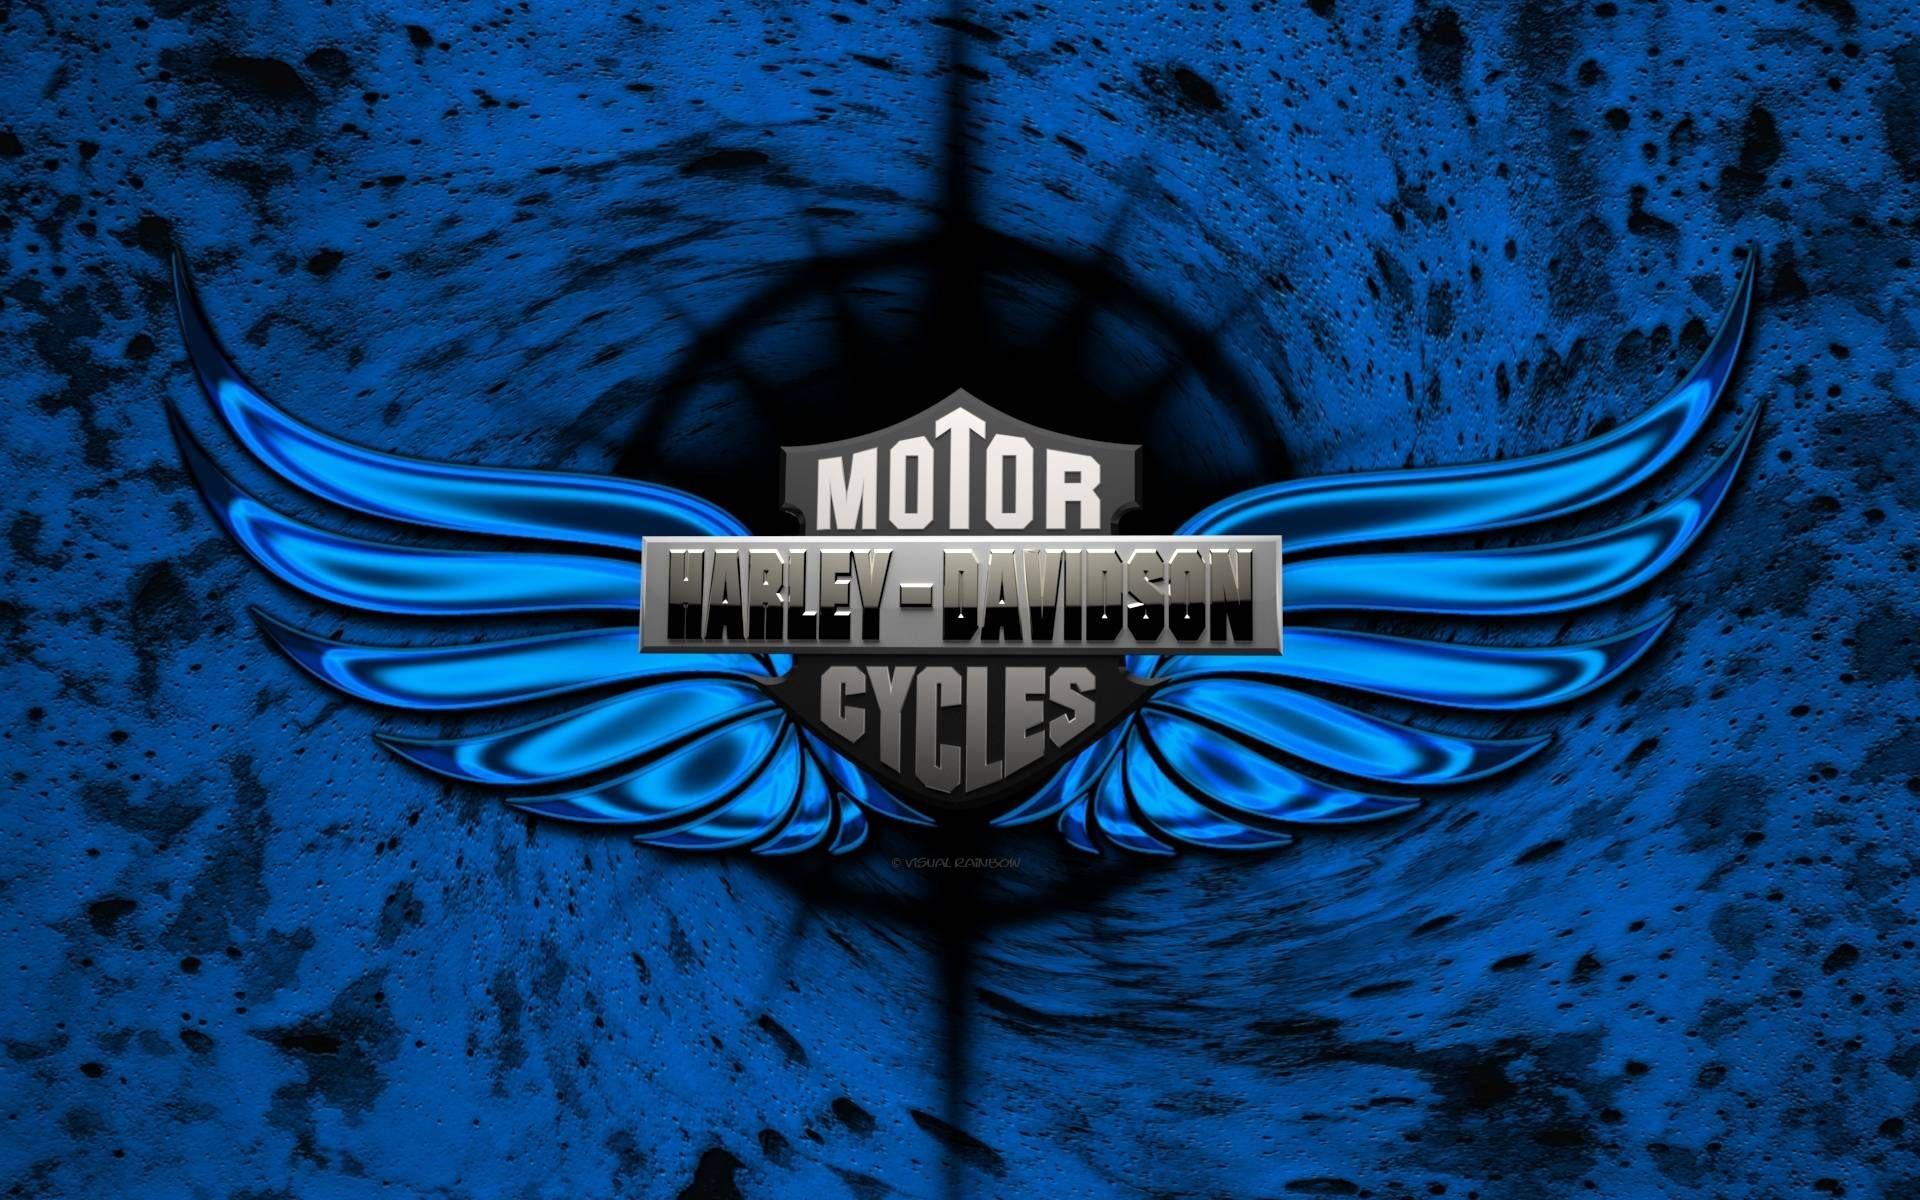 Harley Davidson Logo Wallpapers Harley Davidson Wallpaper Harley Davidson Images Harley Davidson Logo